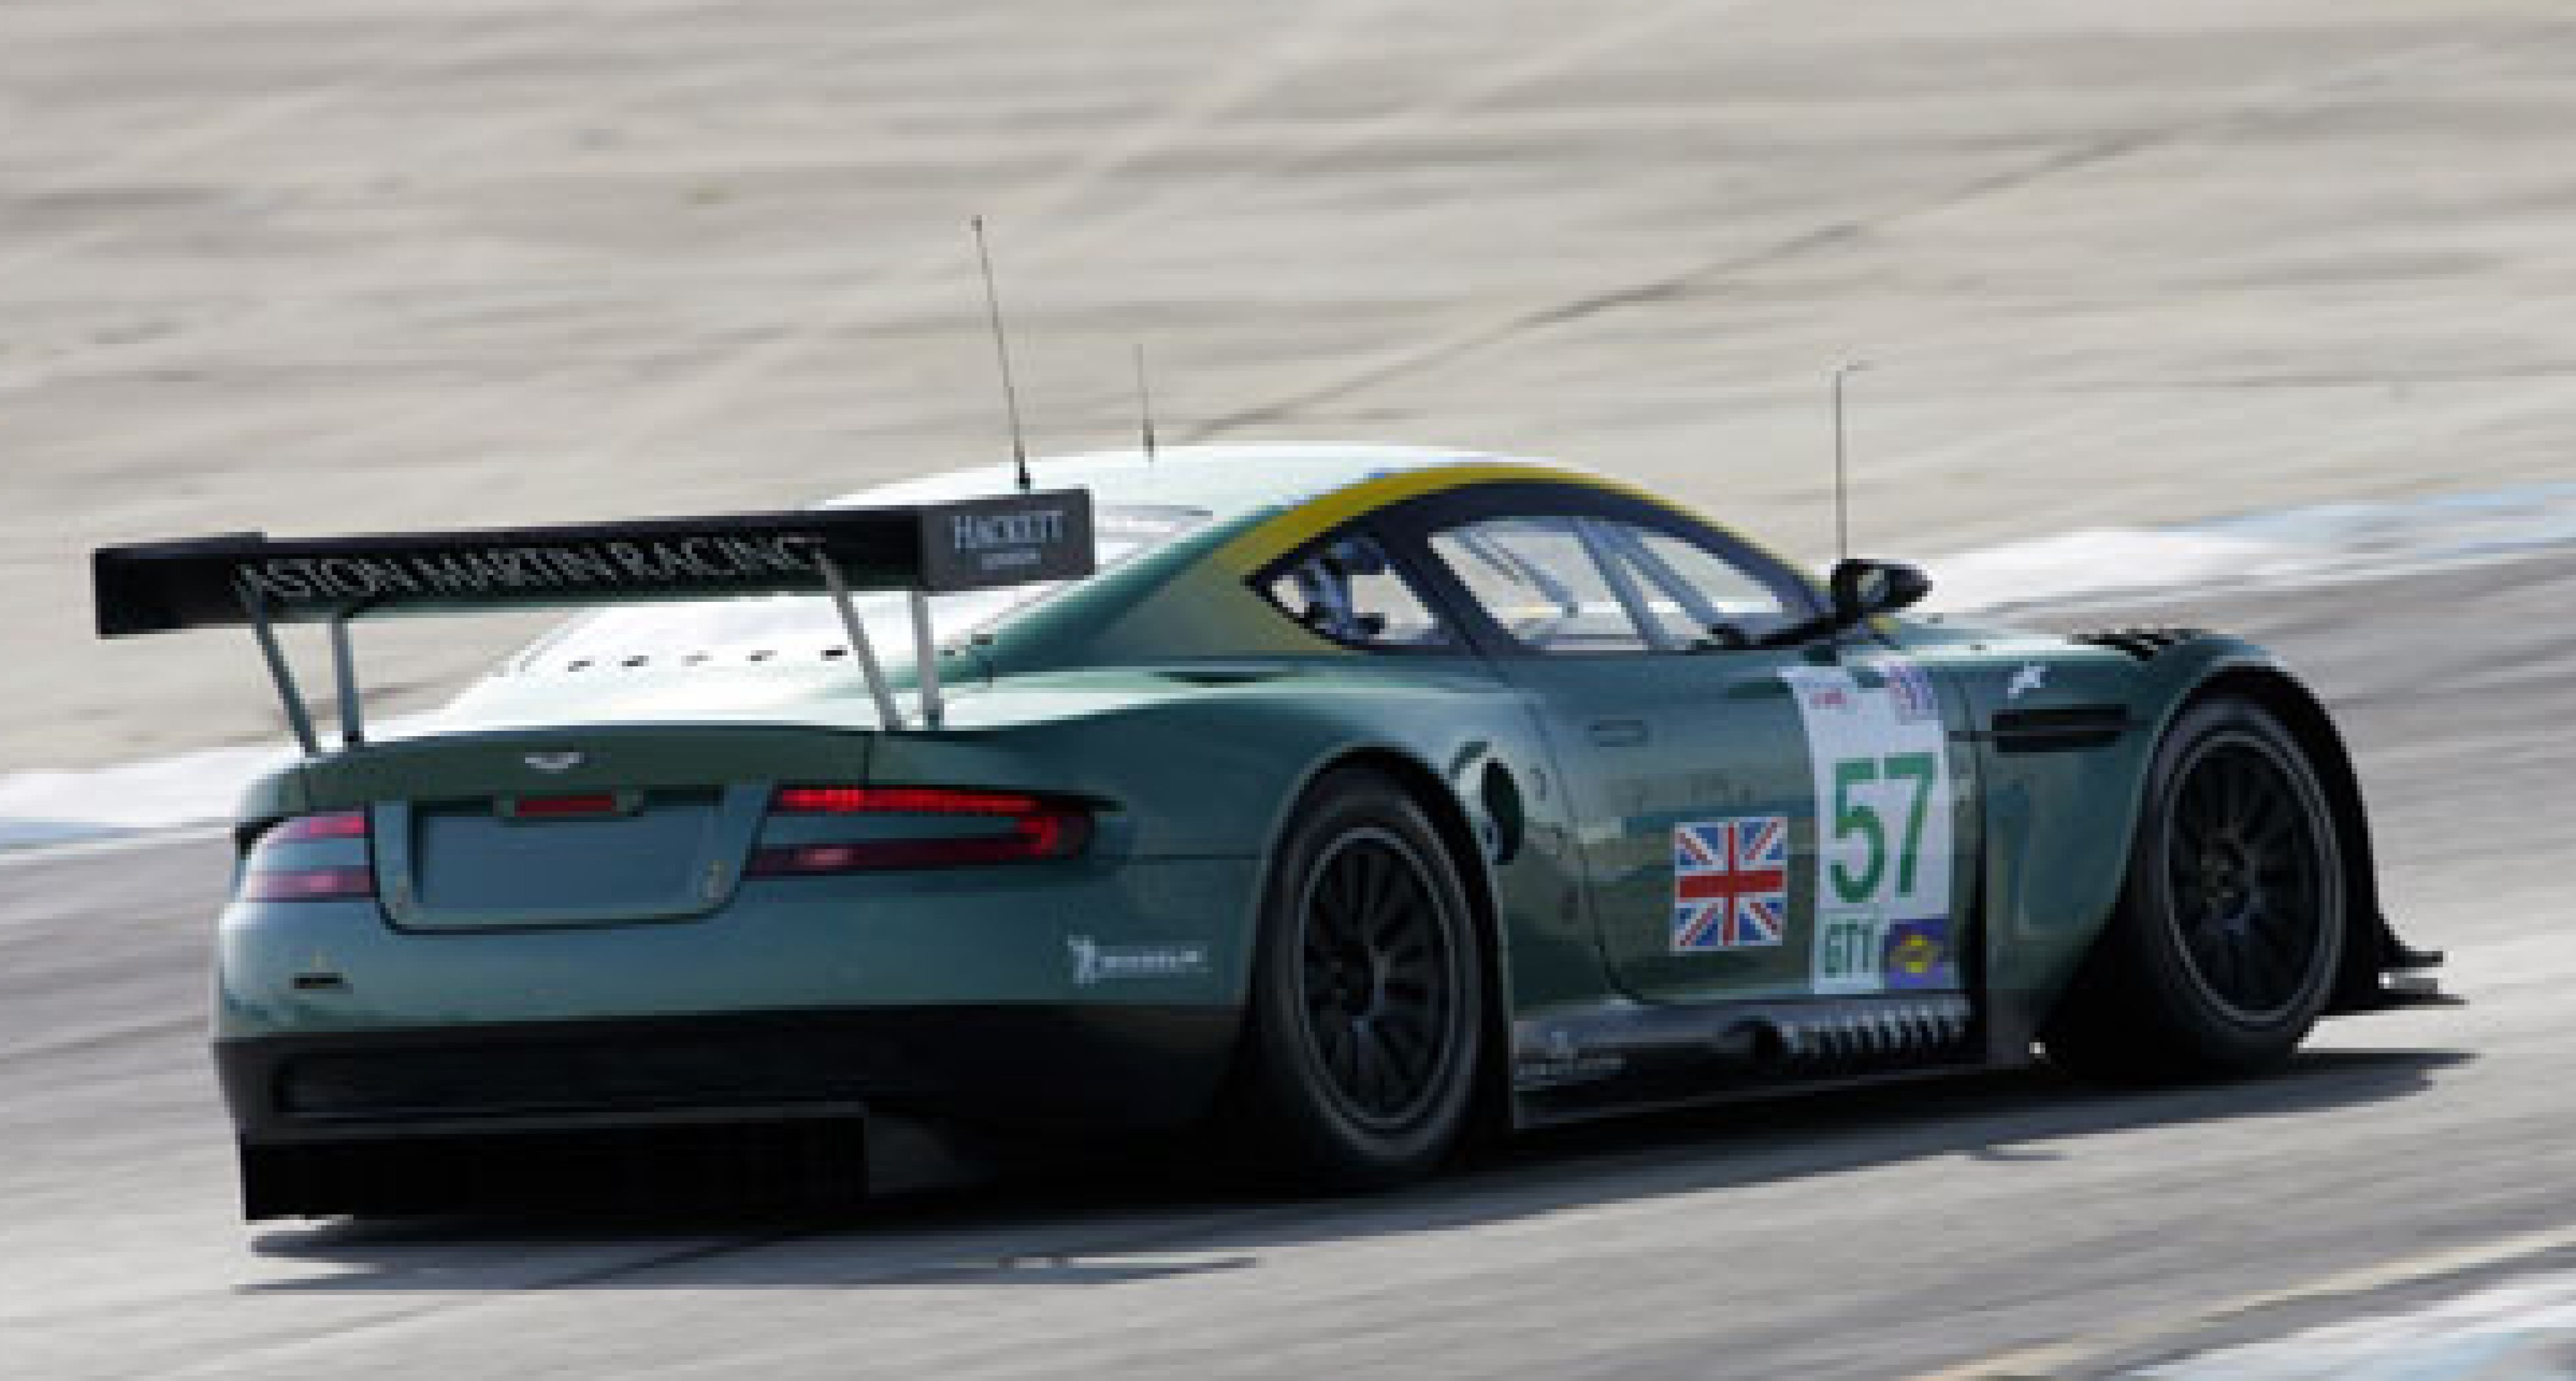 Triumphant debut for Aston Martin at Sebring